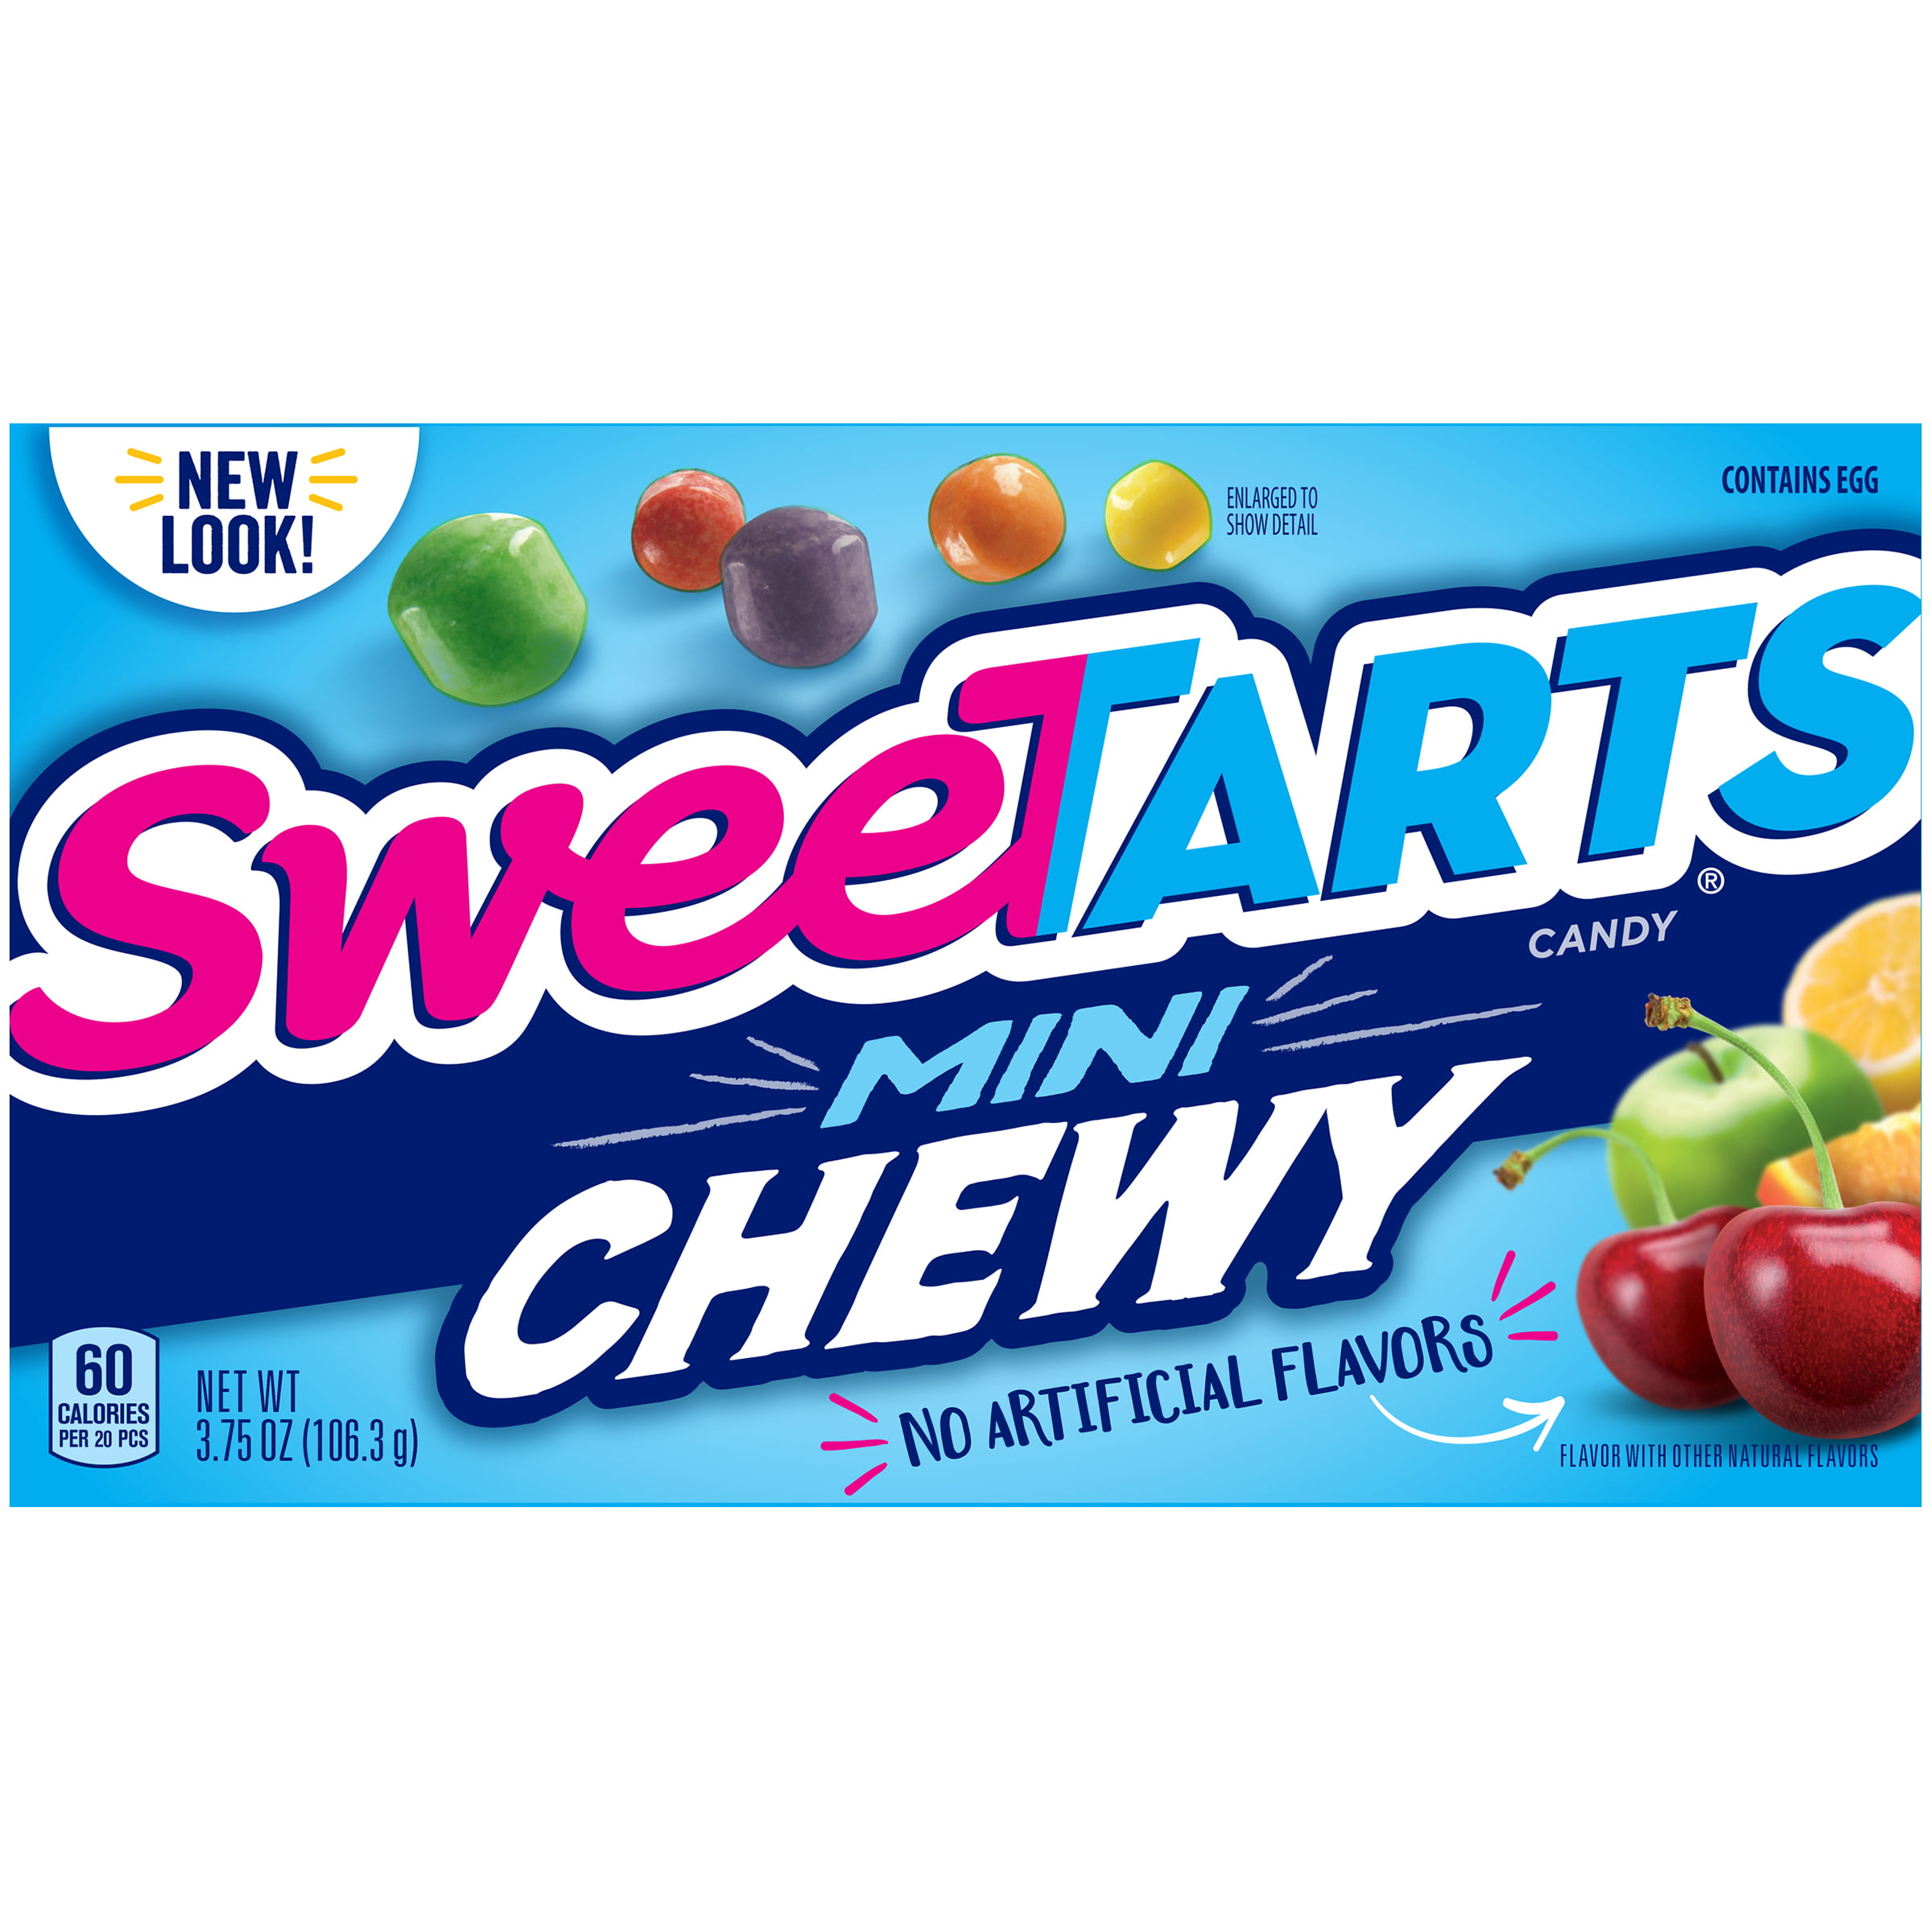 SWEETARTS Mini Chewy Candy 3.75 oz. Box - Walmart.com